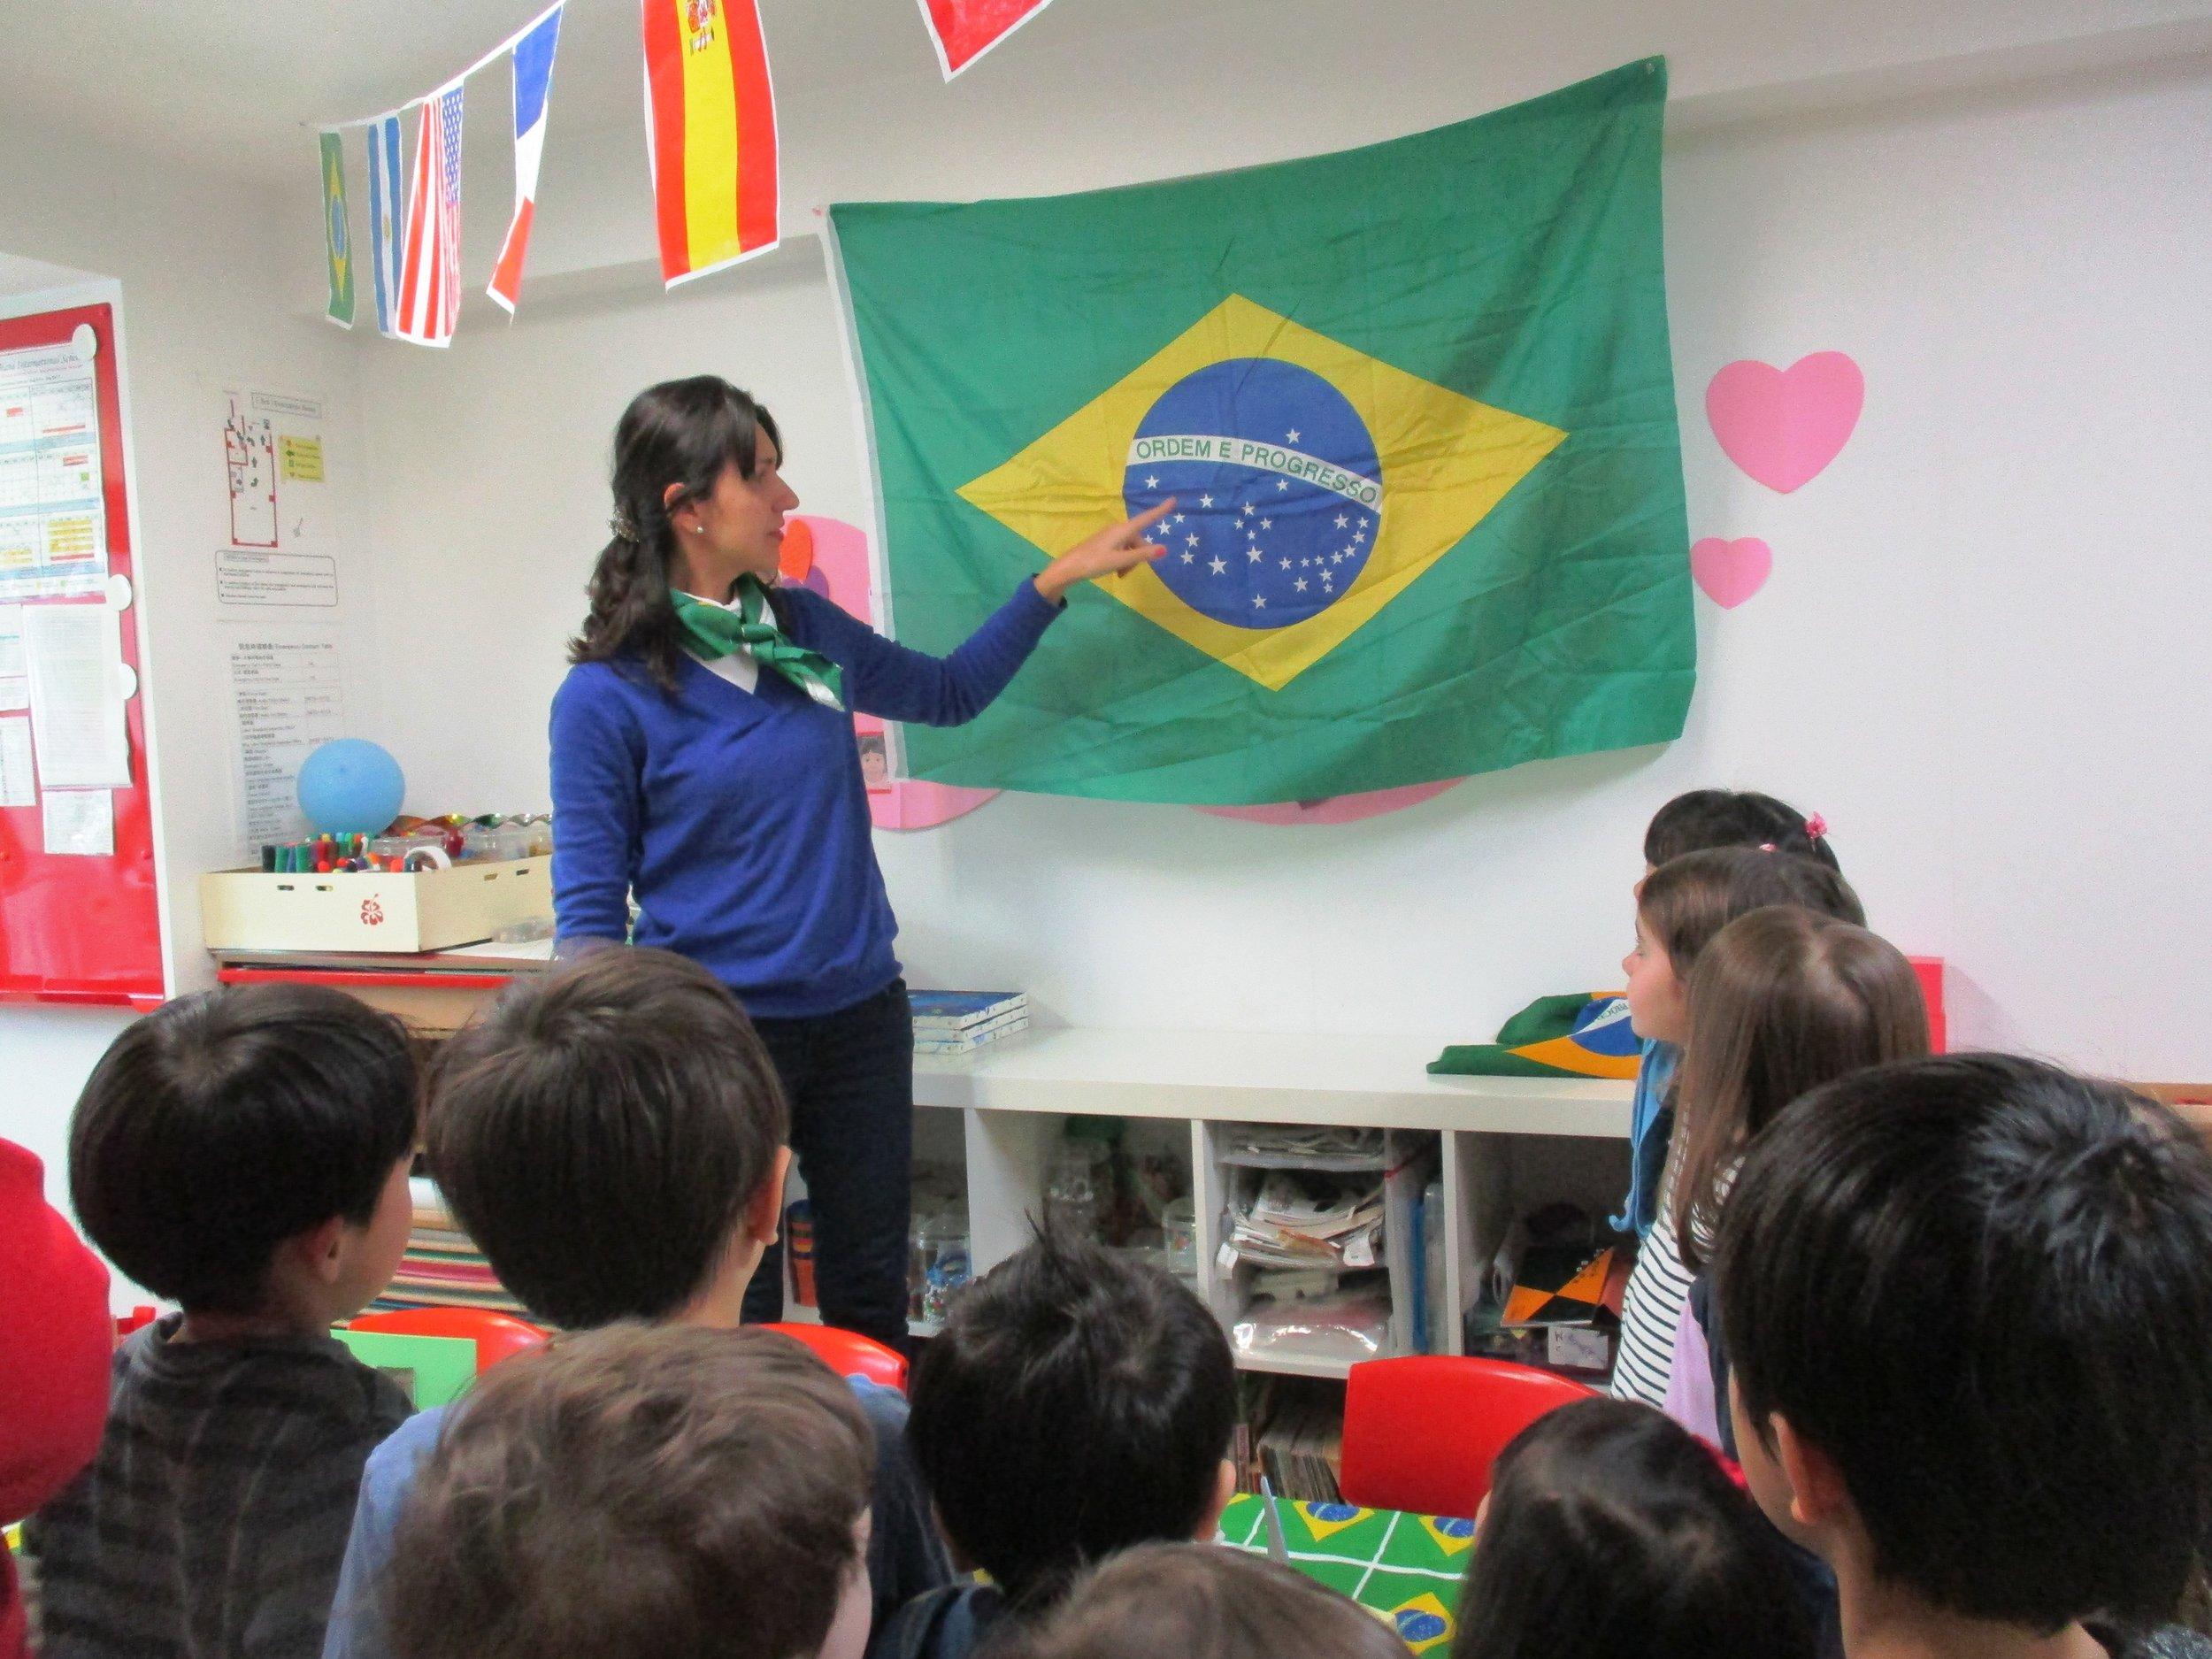 Marilia, as she explains to us about the Brazilian flag.